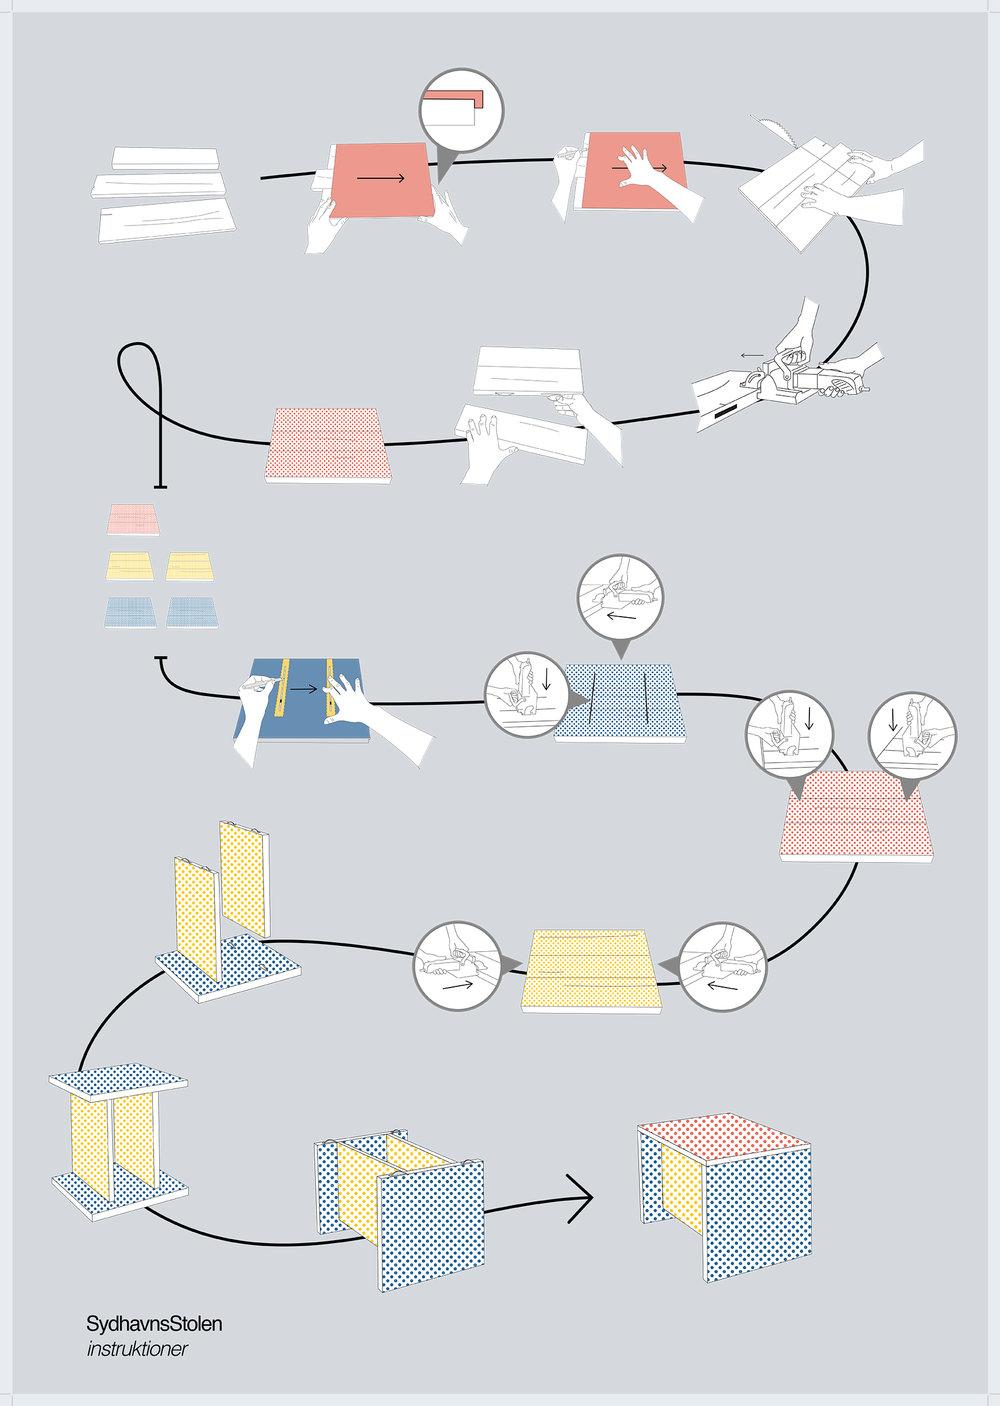 poster_instructions_final-1.jpg